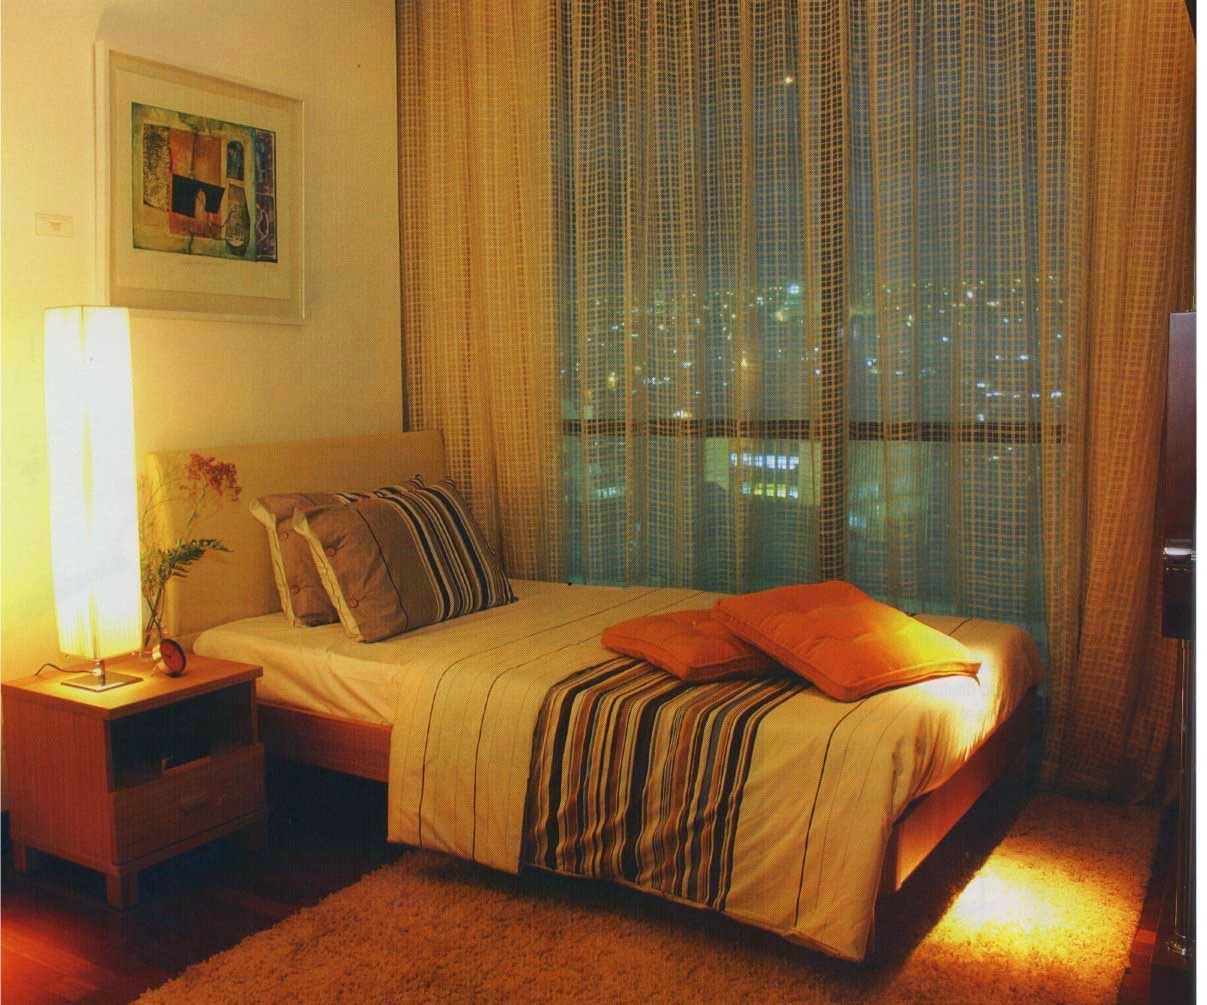 Pencahayaan Ideal Untuk Rumah dan Kamar